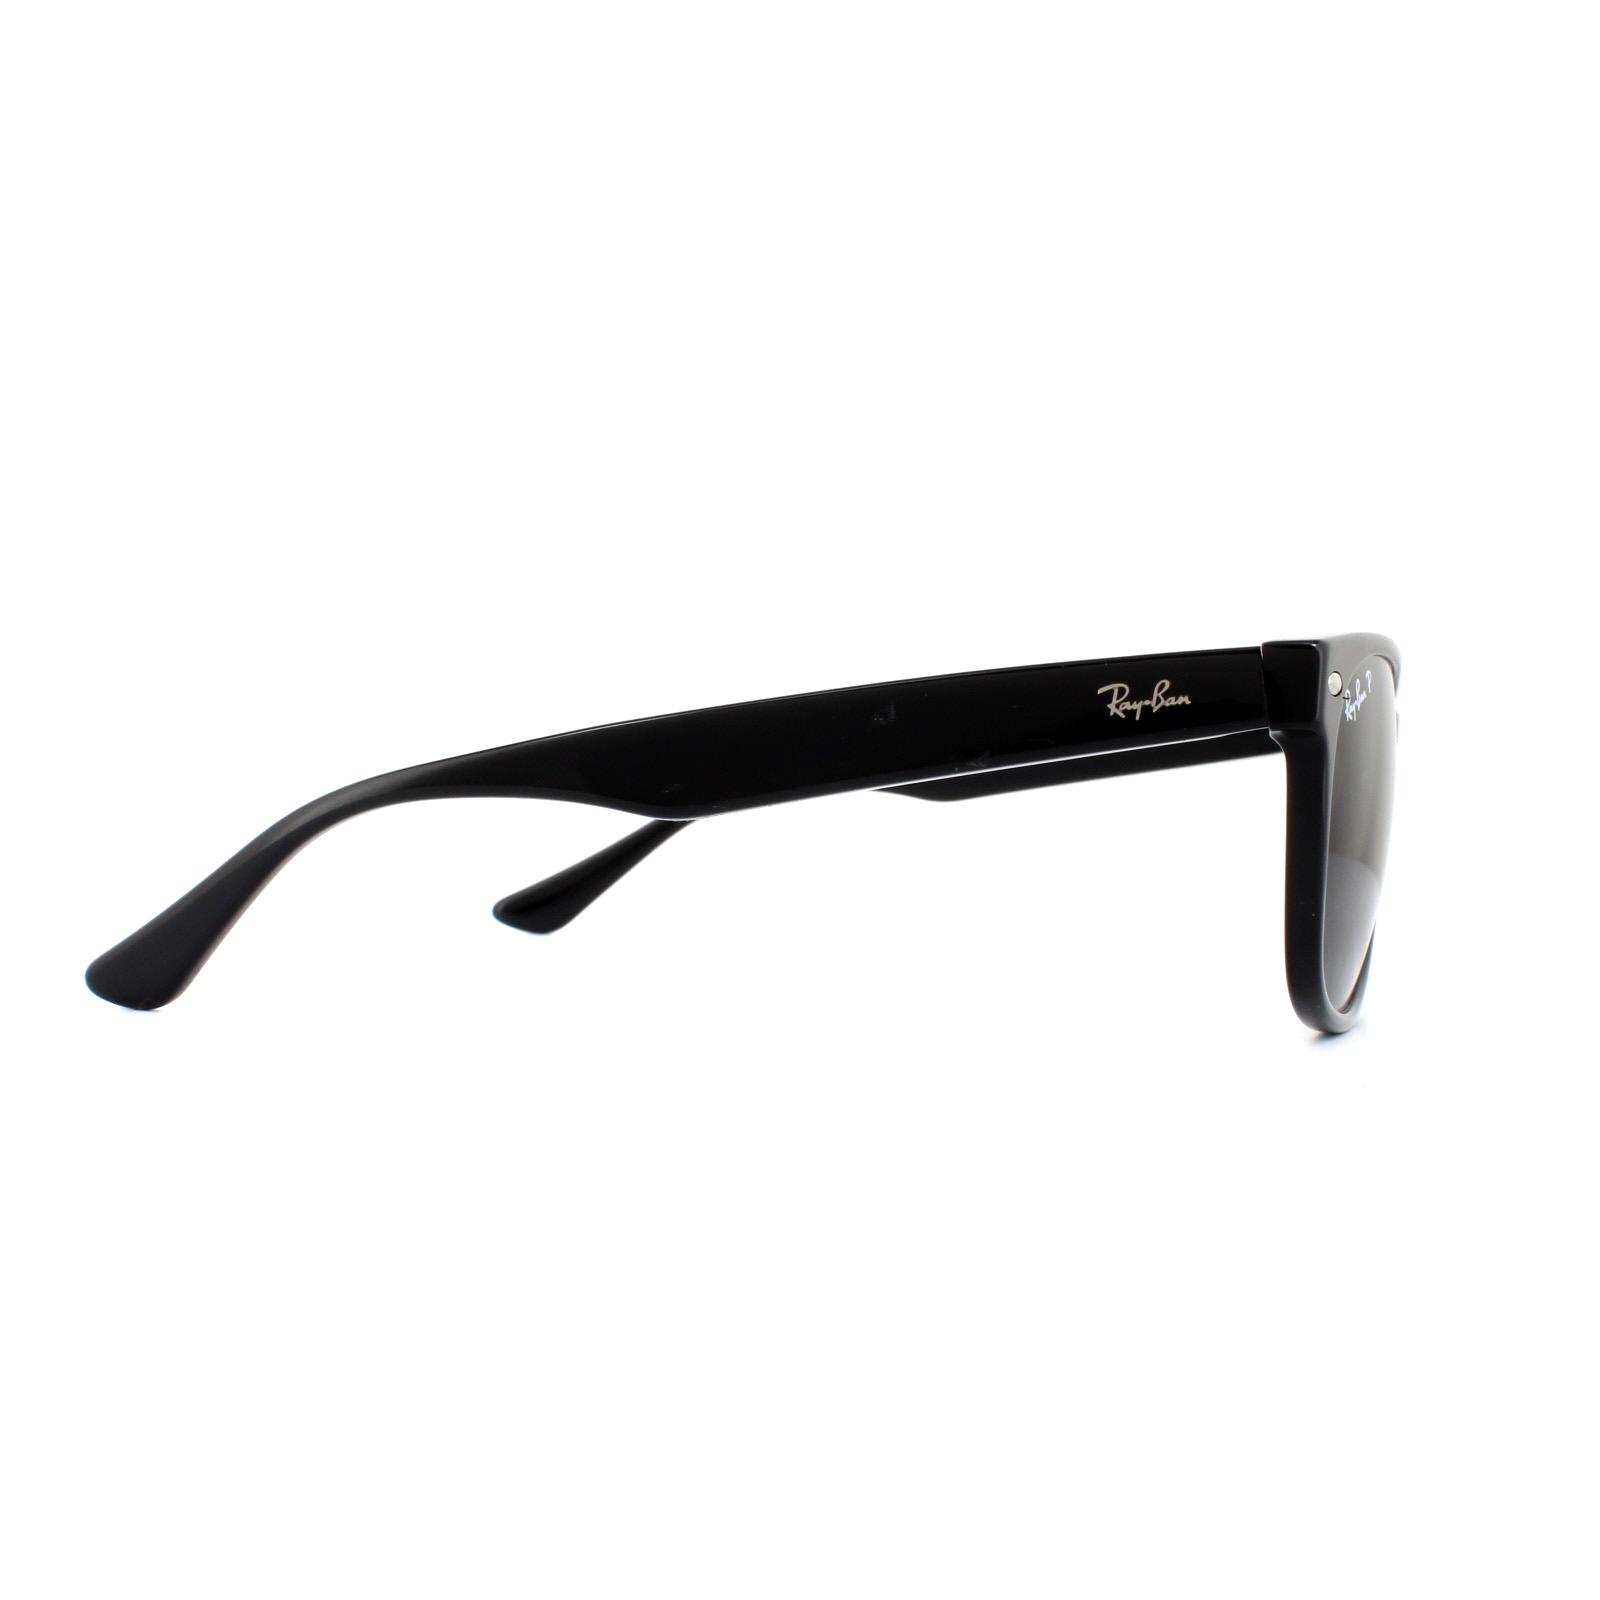 037c8c249f7 Ray-Ban Sunglasses RB2184 901 58 Black Green 8053672970944